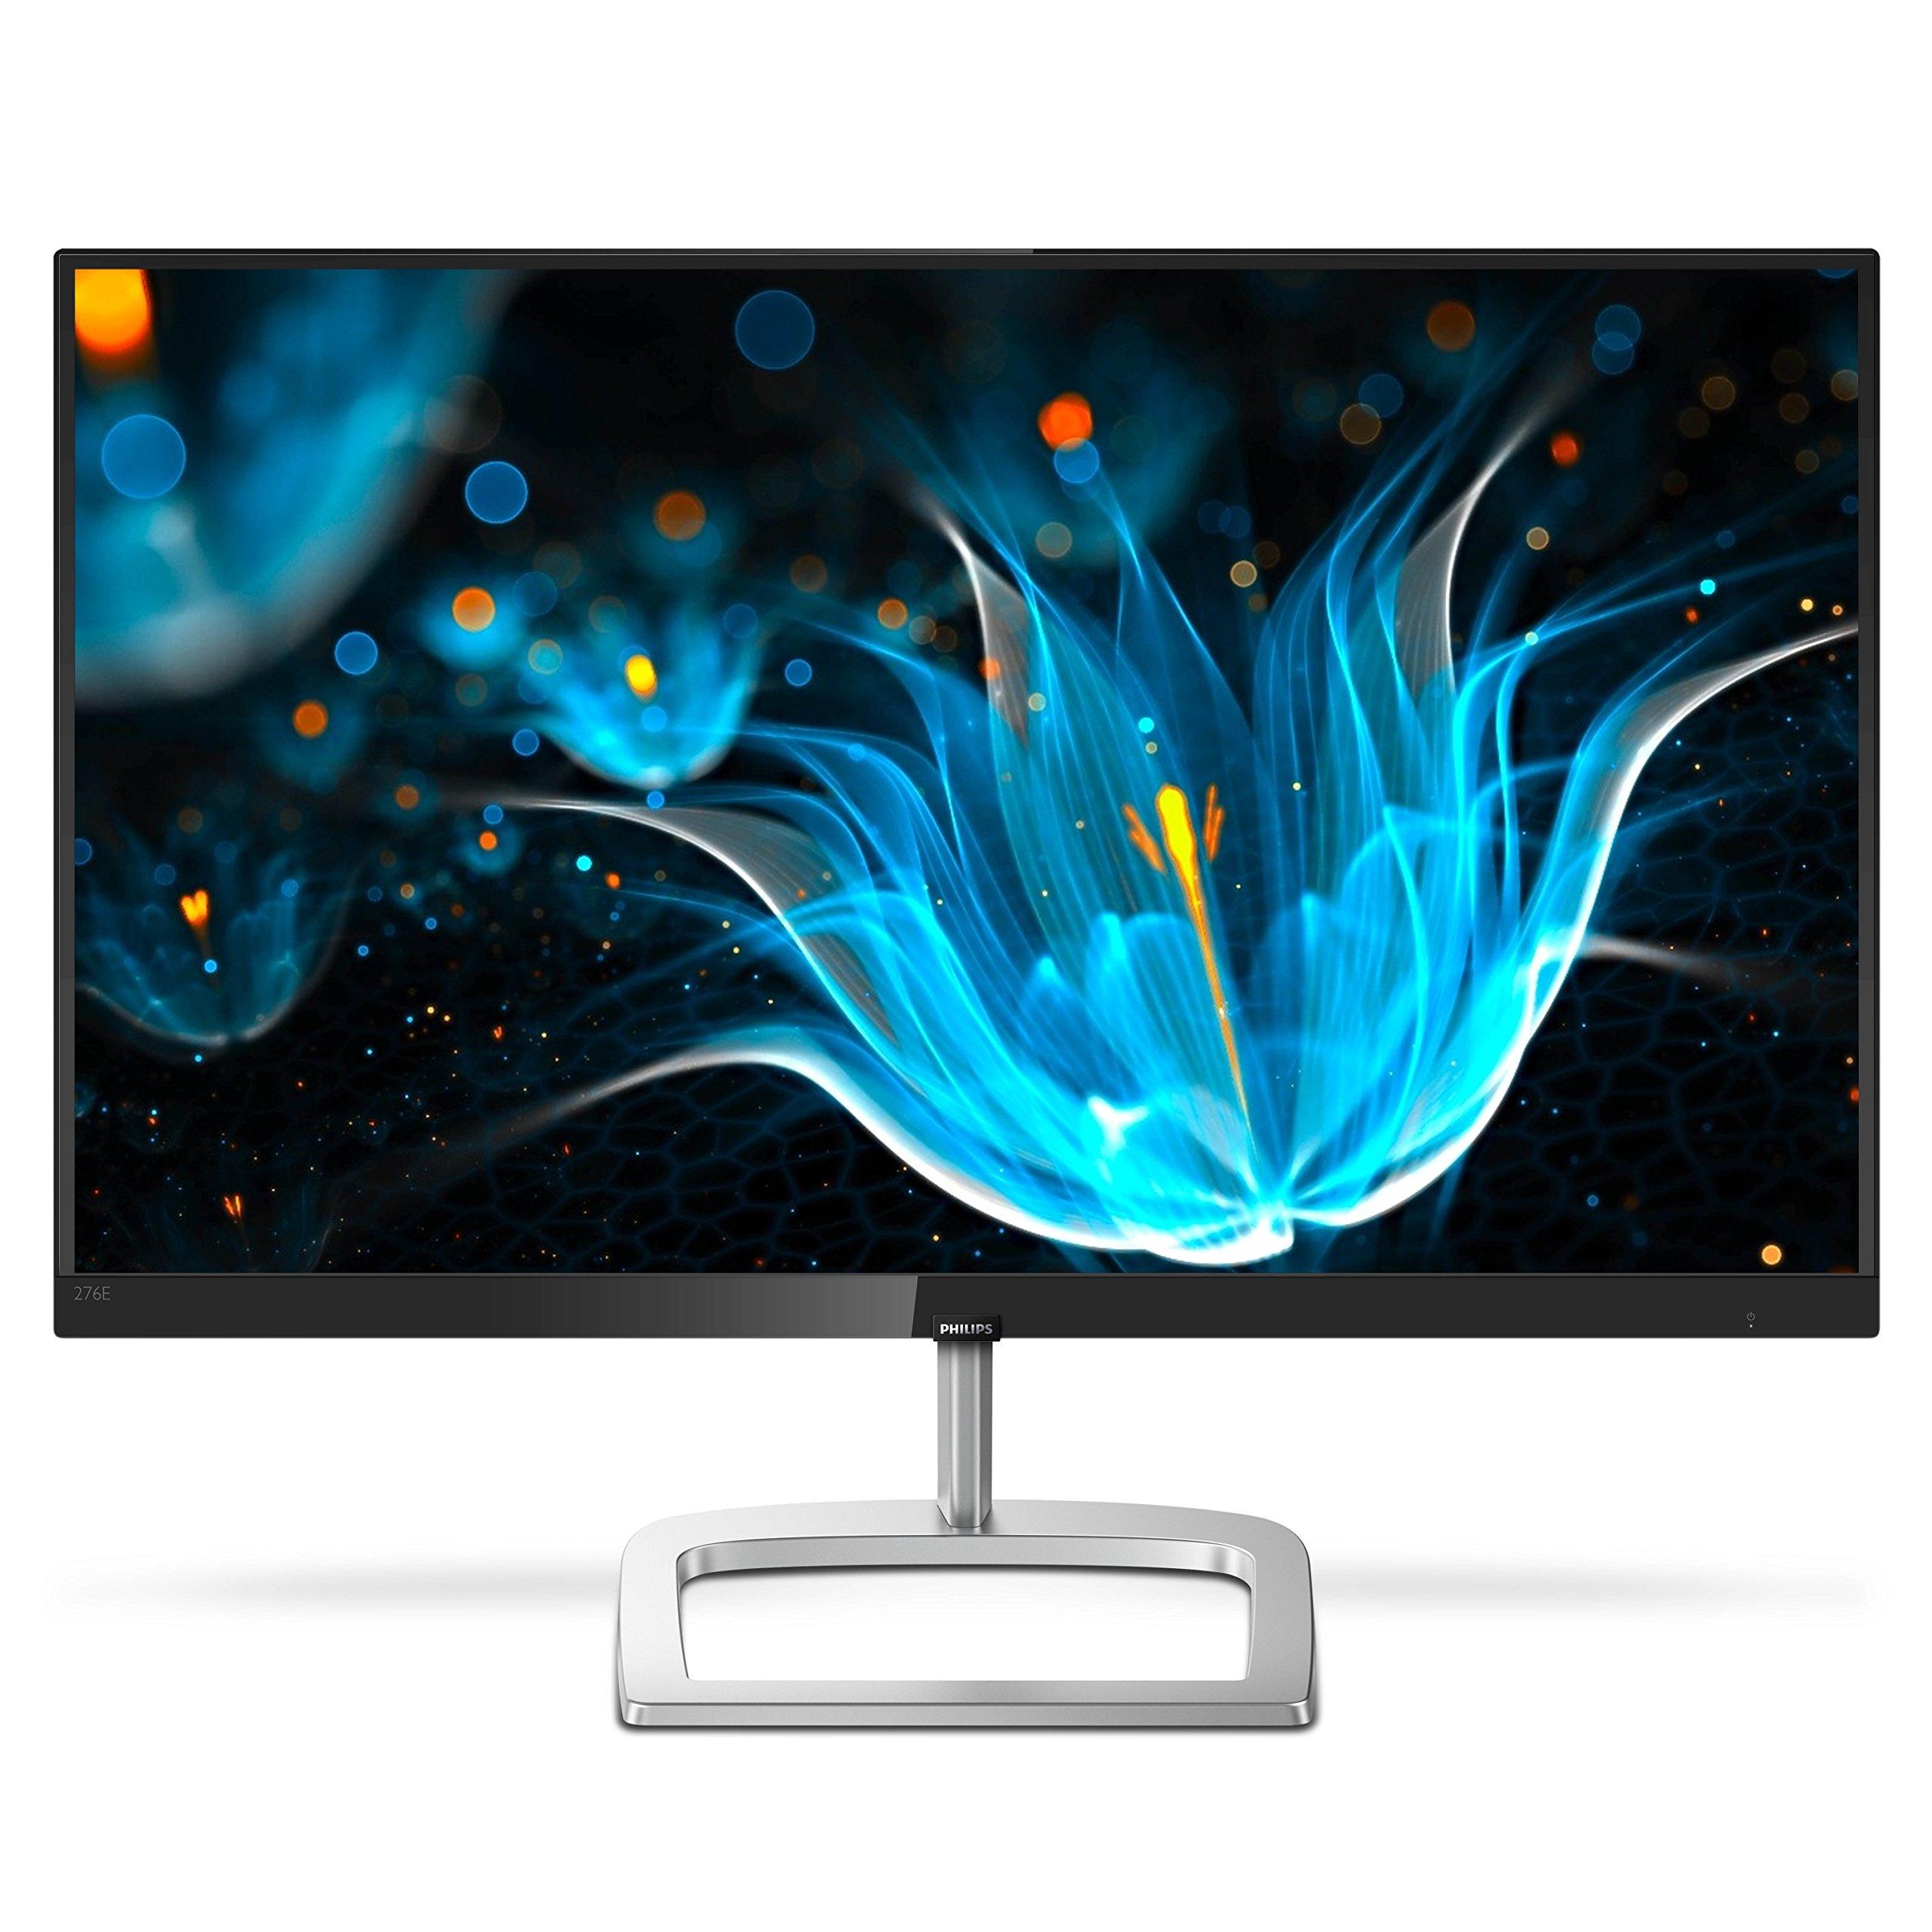 Philips 276E9QDSB 27'' Frameless Monitor, Full HD 1920x1080 IPS, 124% sRGB & 93% NTSC, FreeSync, HDMI/DVI-D/VGA, VESA